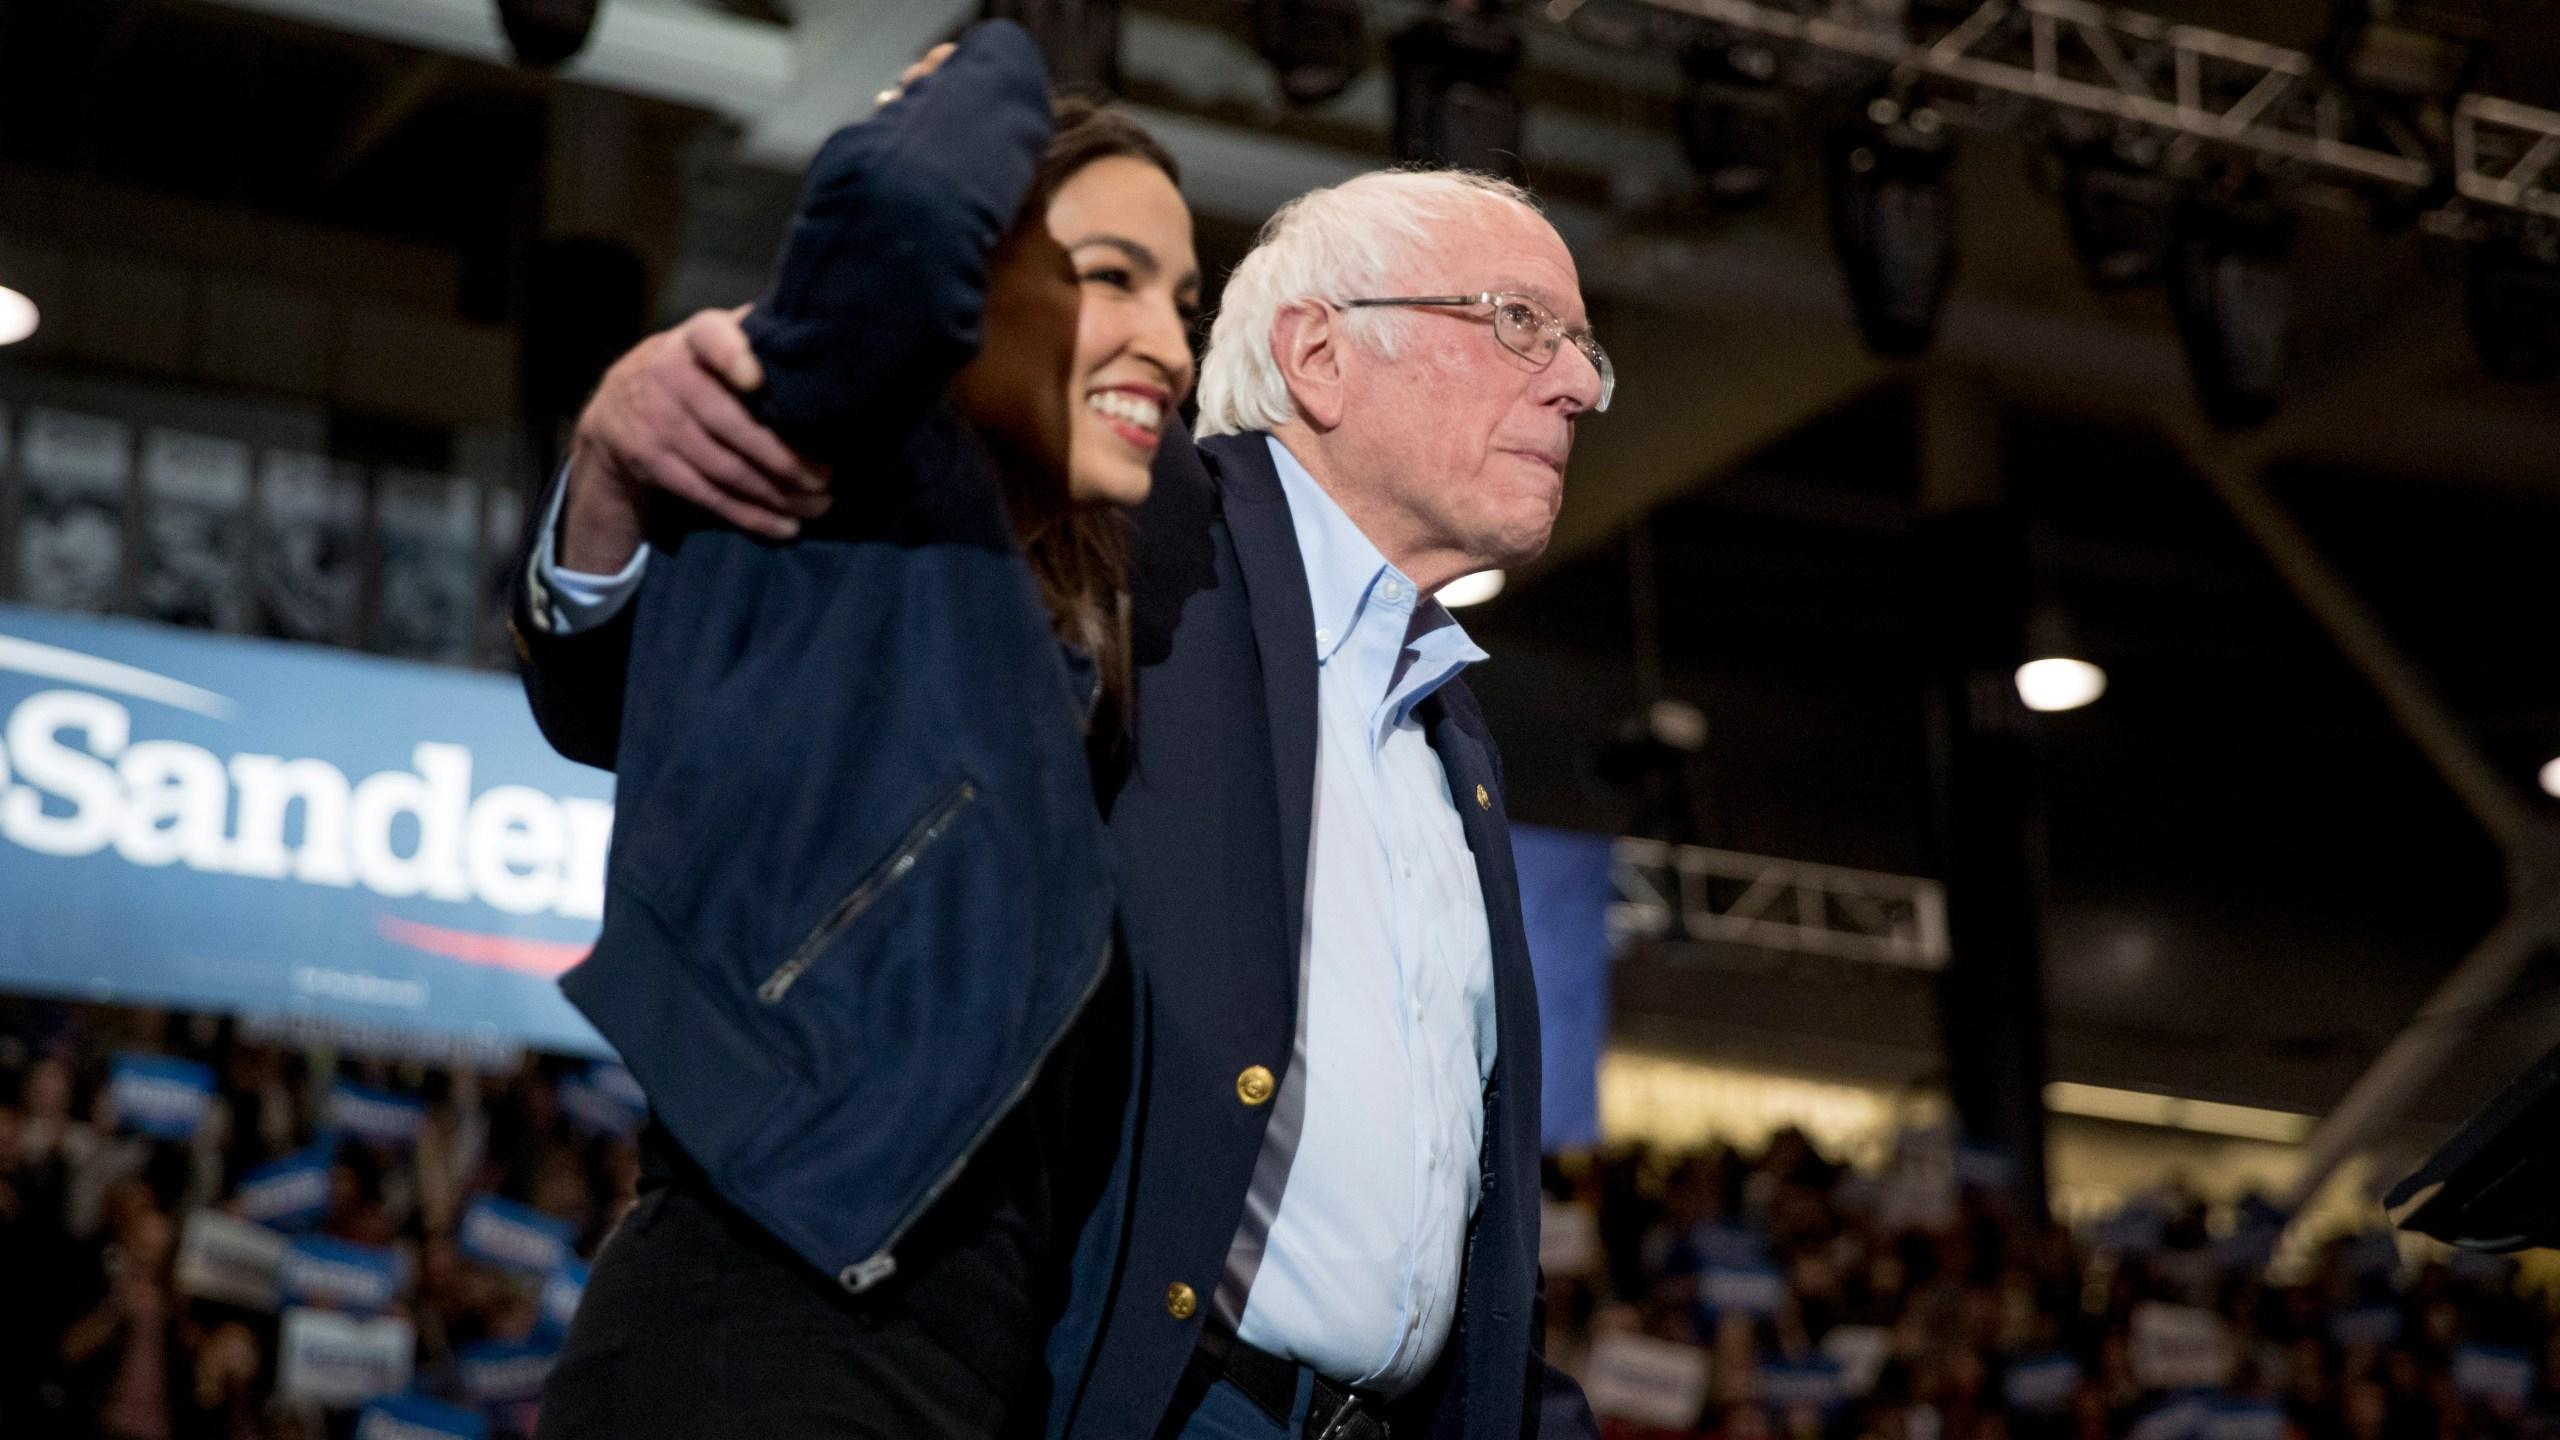 Bernie Sanders, Alexandria Ocasio-Cortez